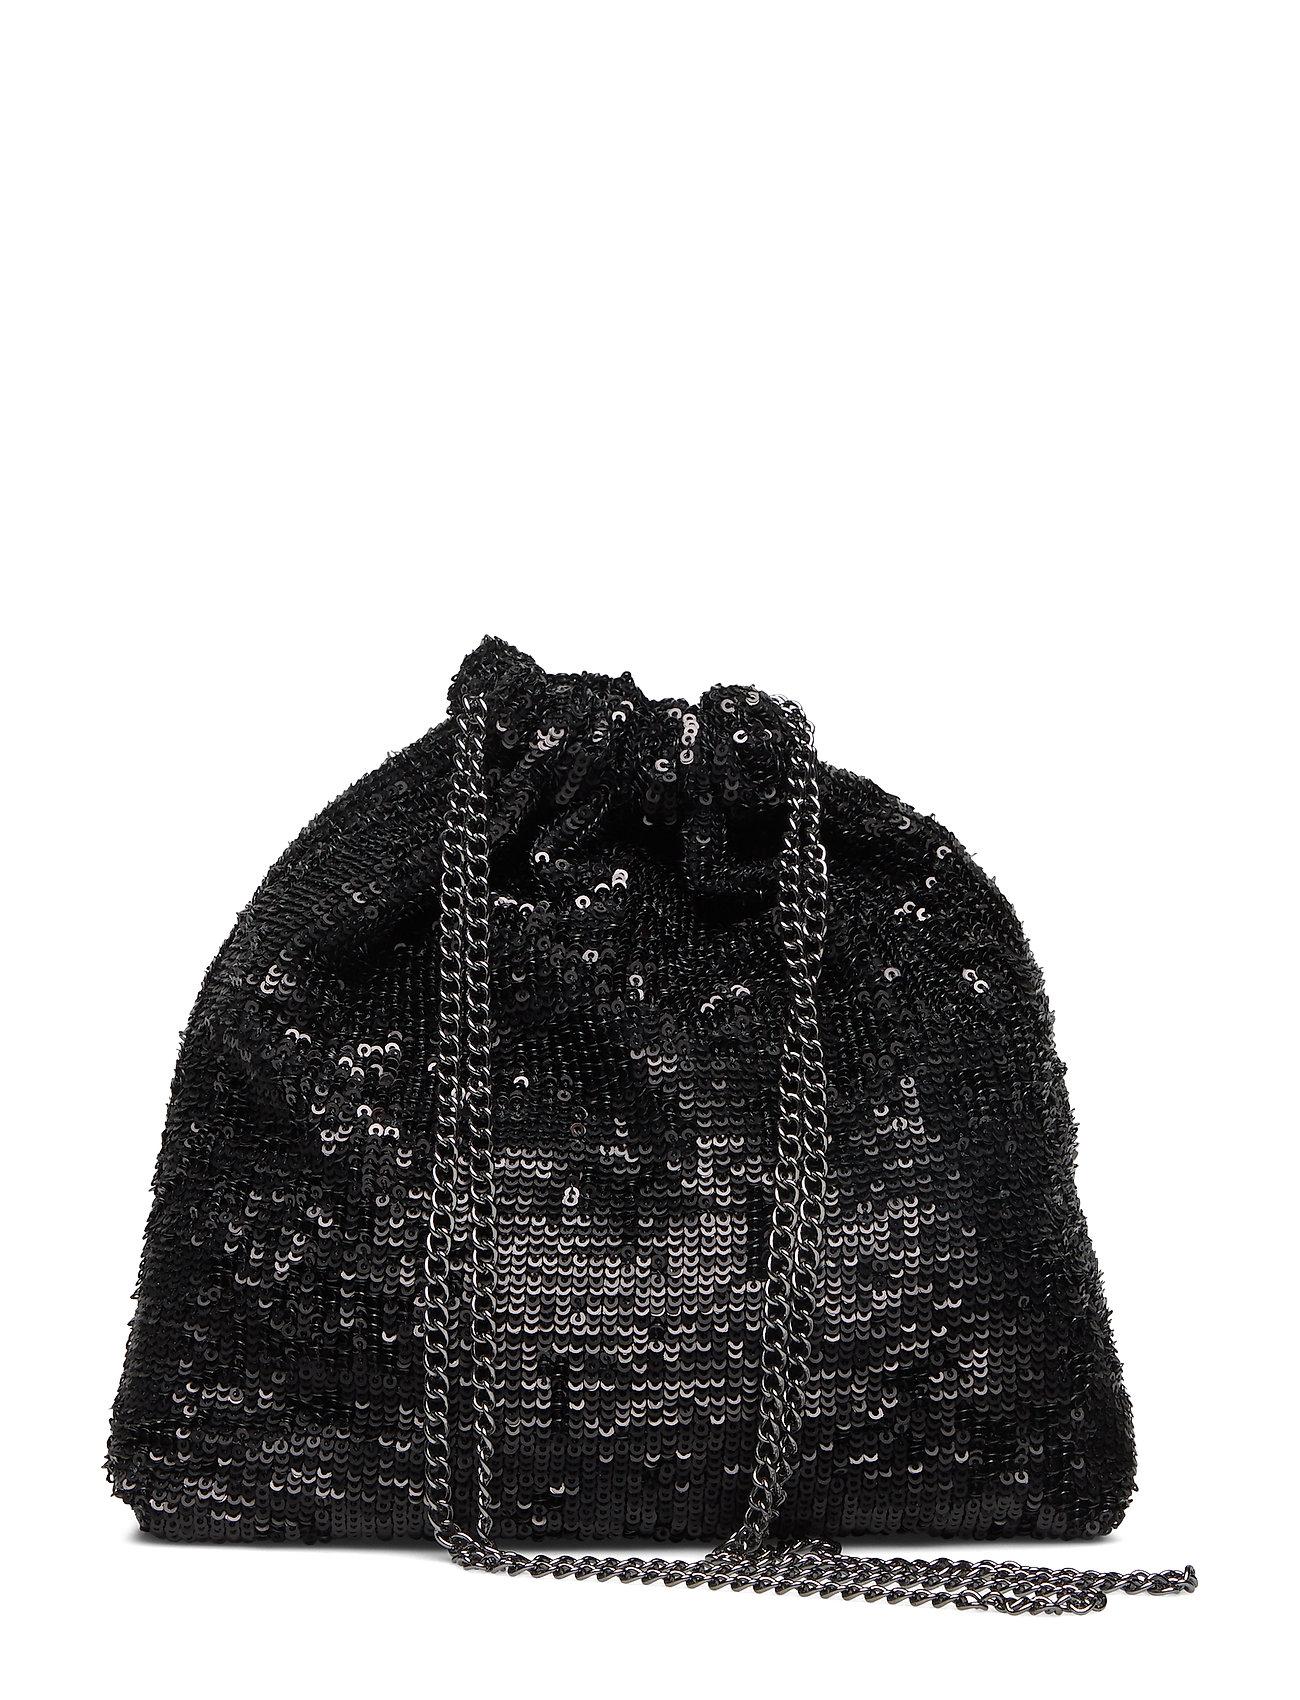 Twist & Tango Katy Sequin Bag - BLACK